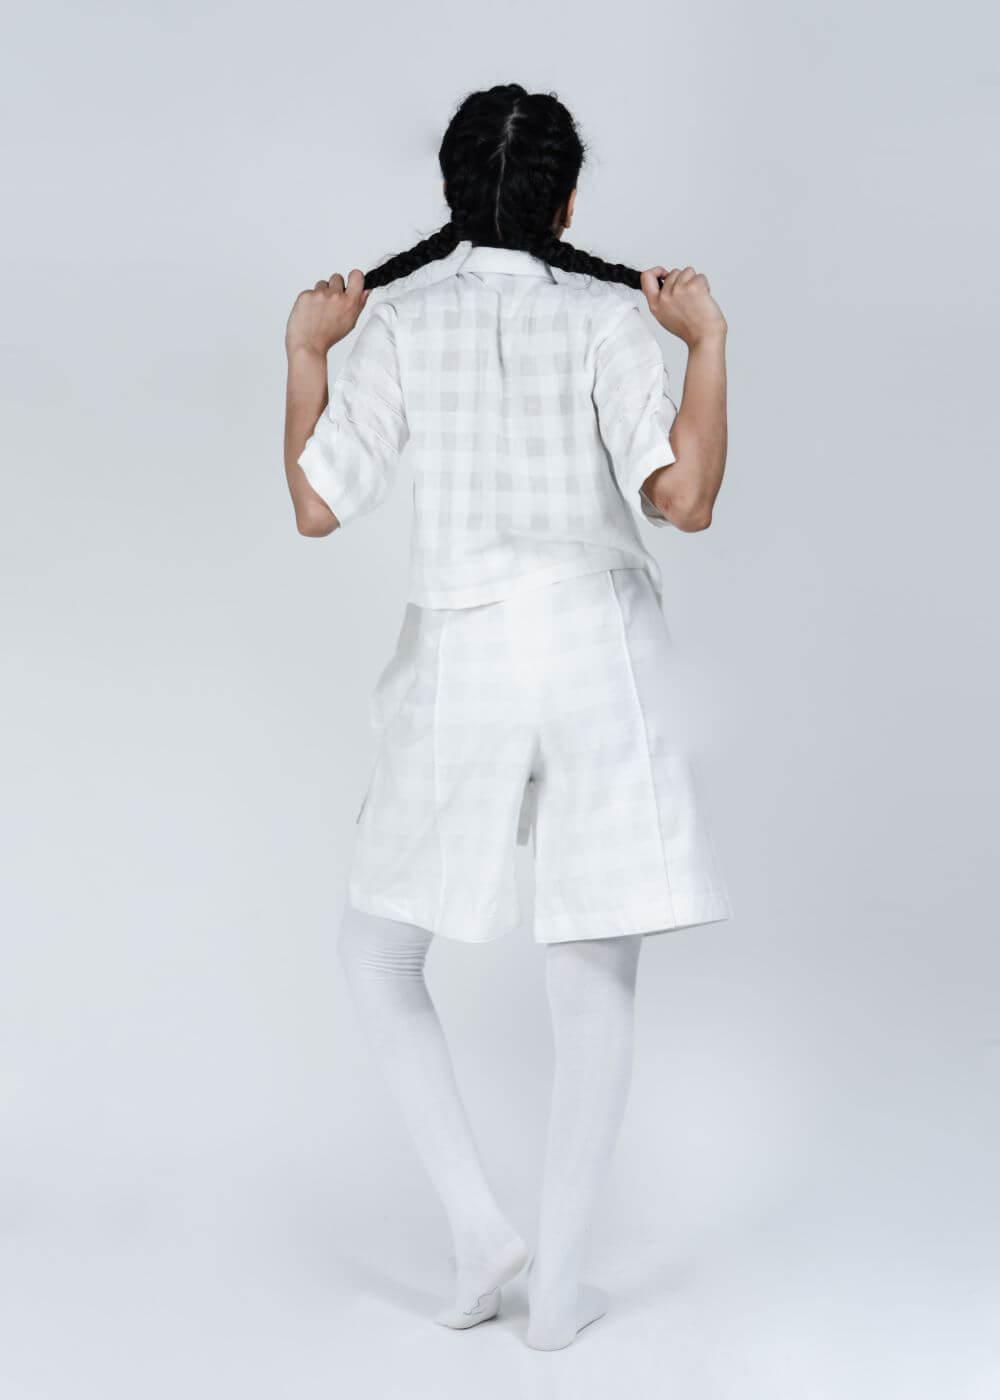 @STOREAT44 | Best Black&White Clothing Brand | 3